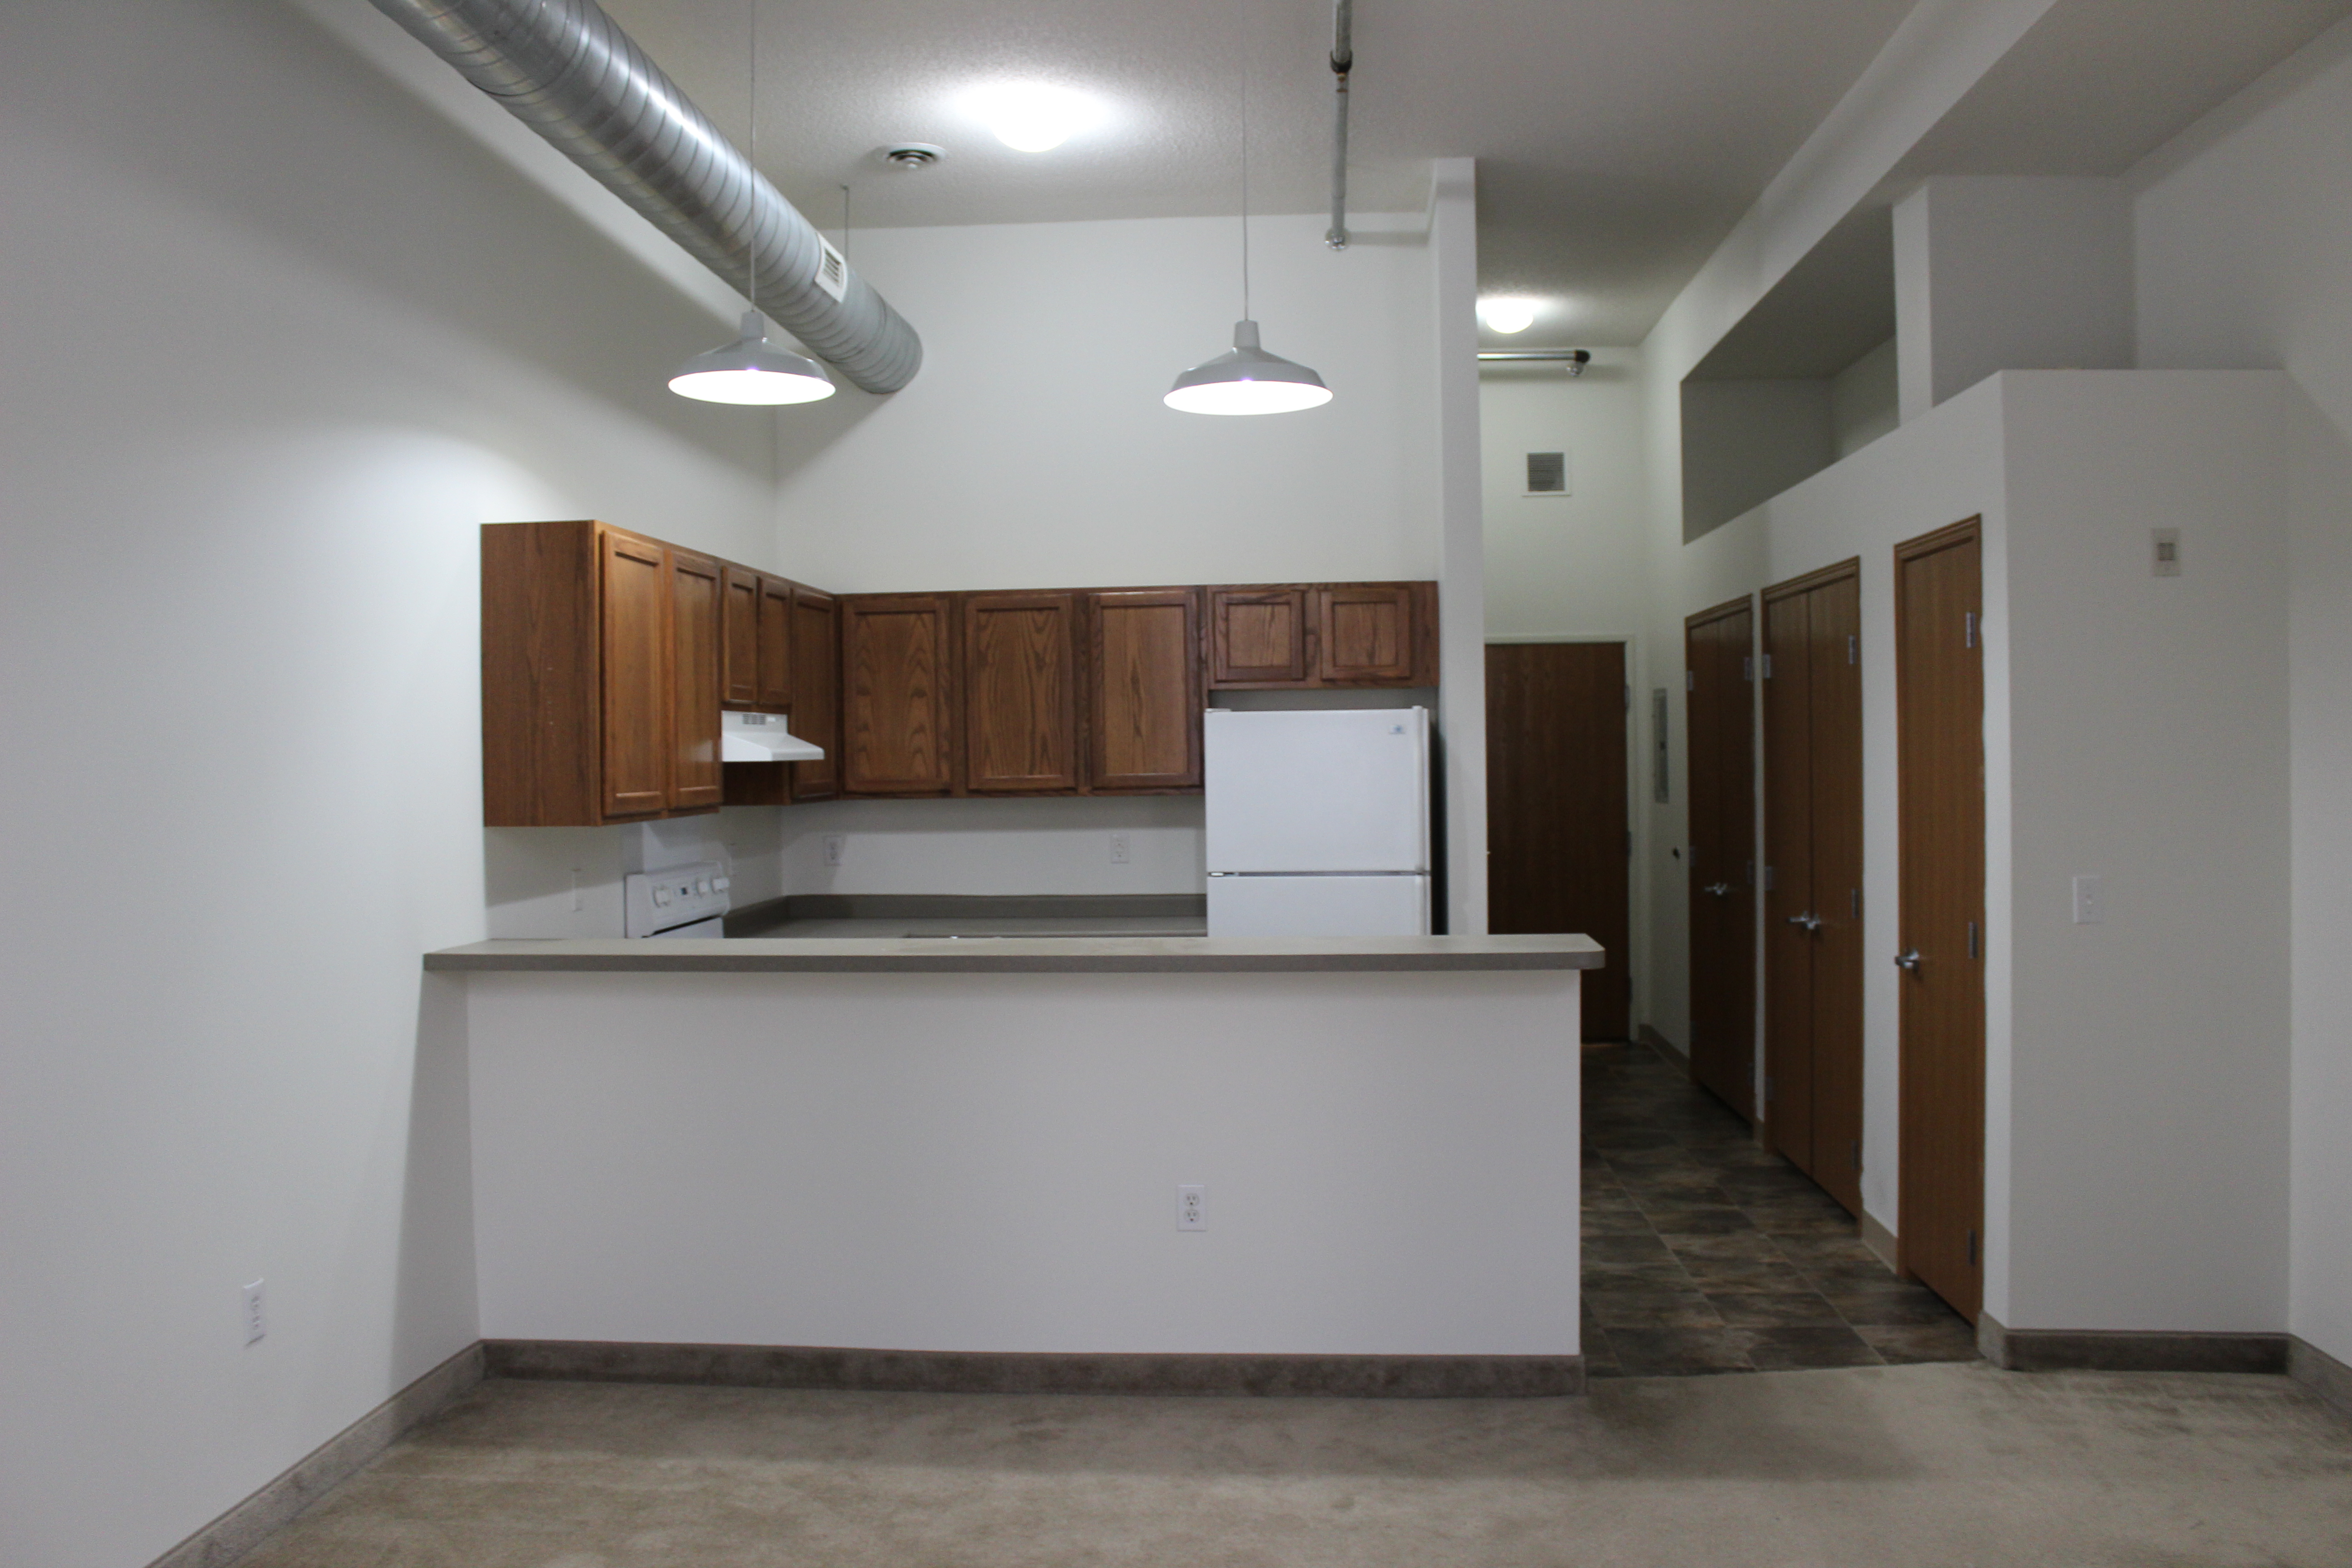 Image of Straus Lofts